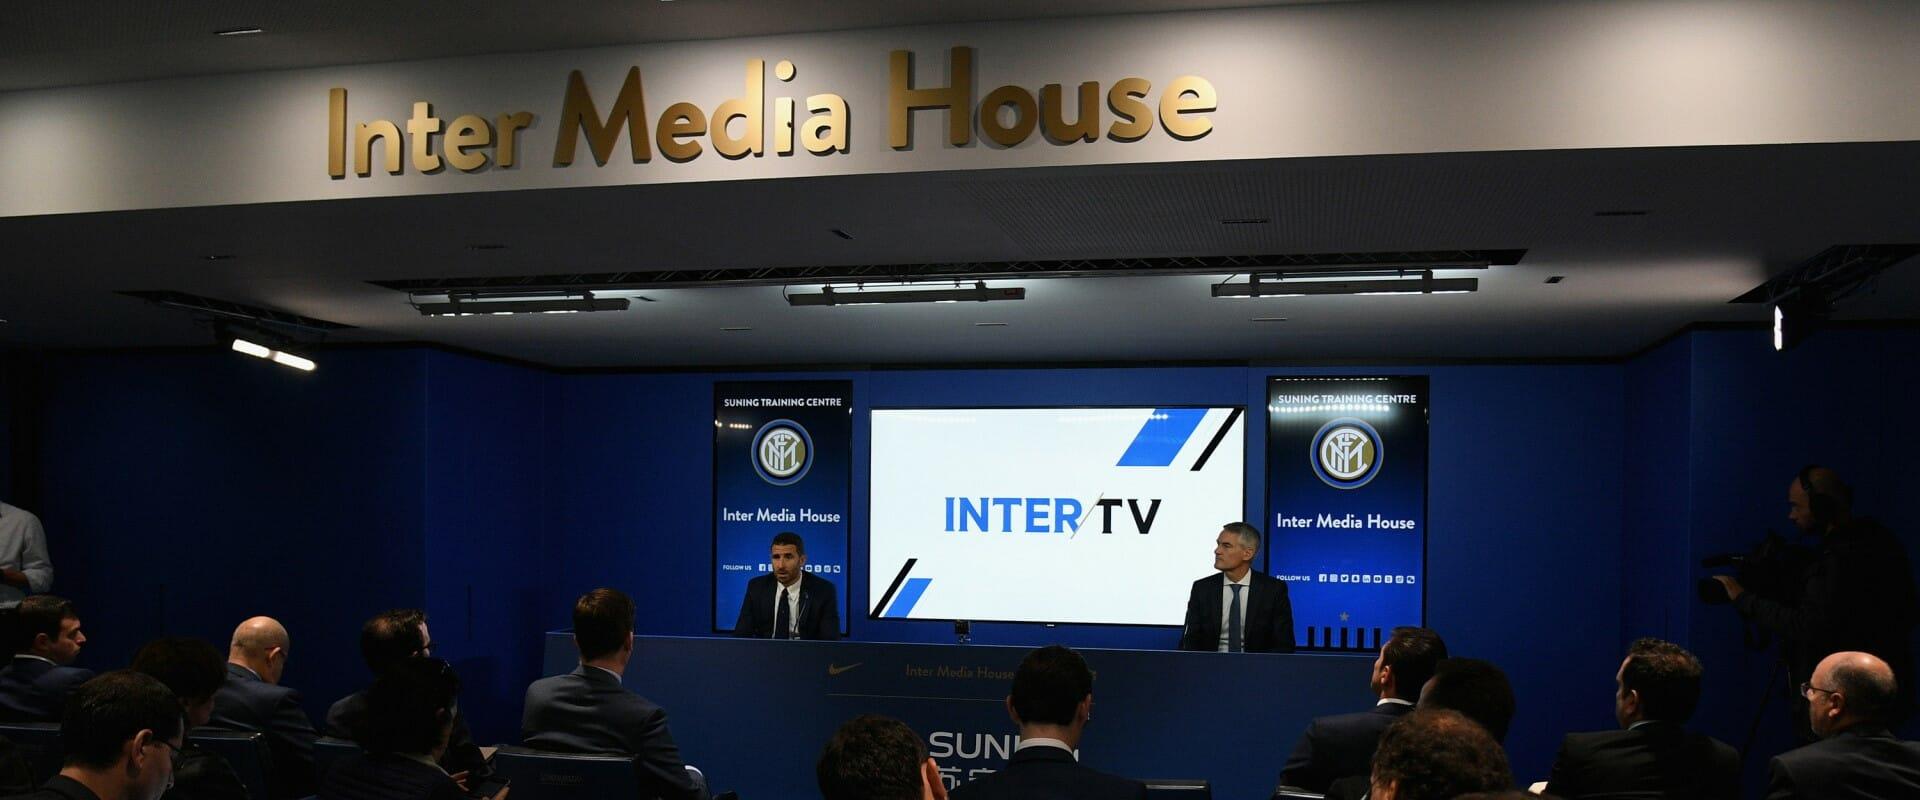 Inter Media House